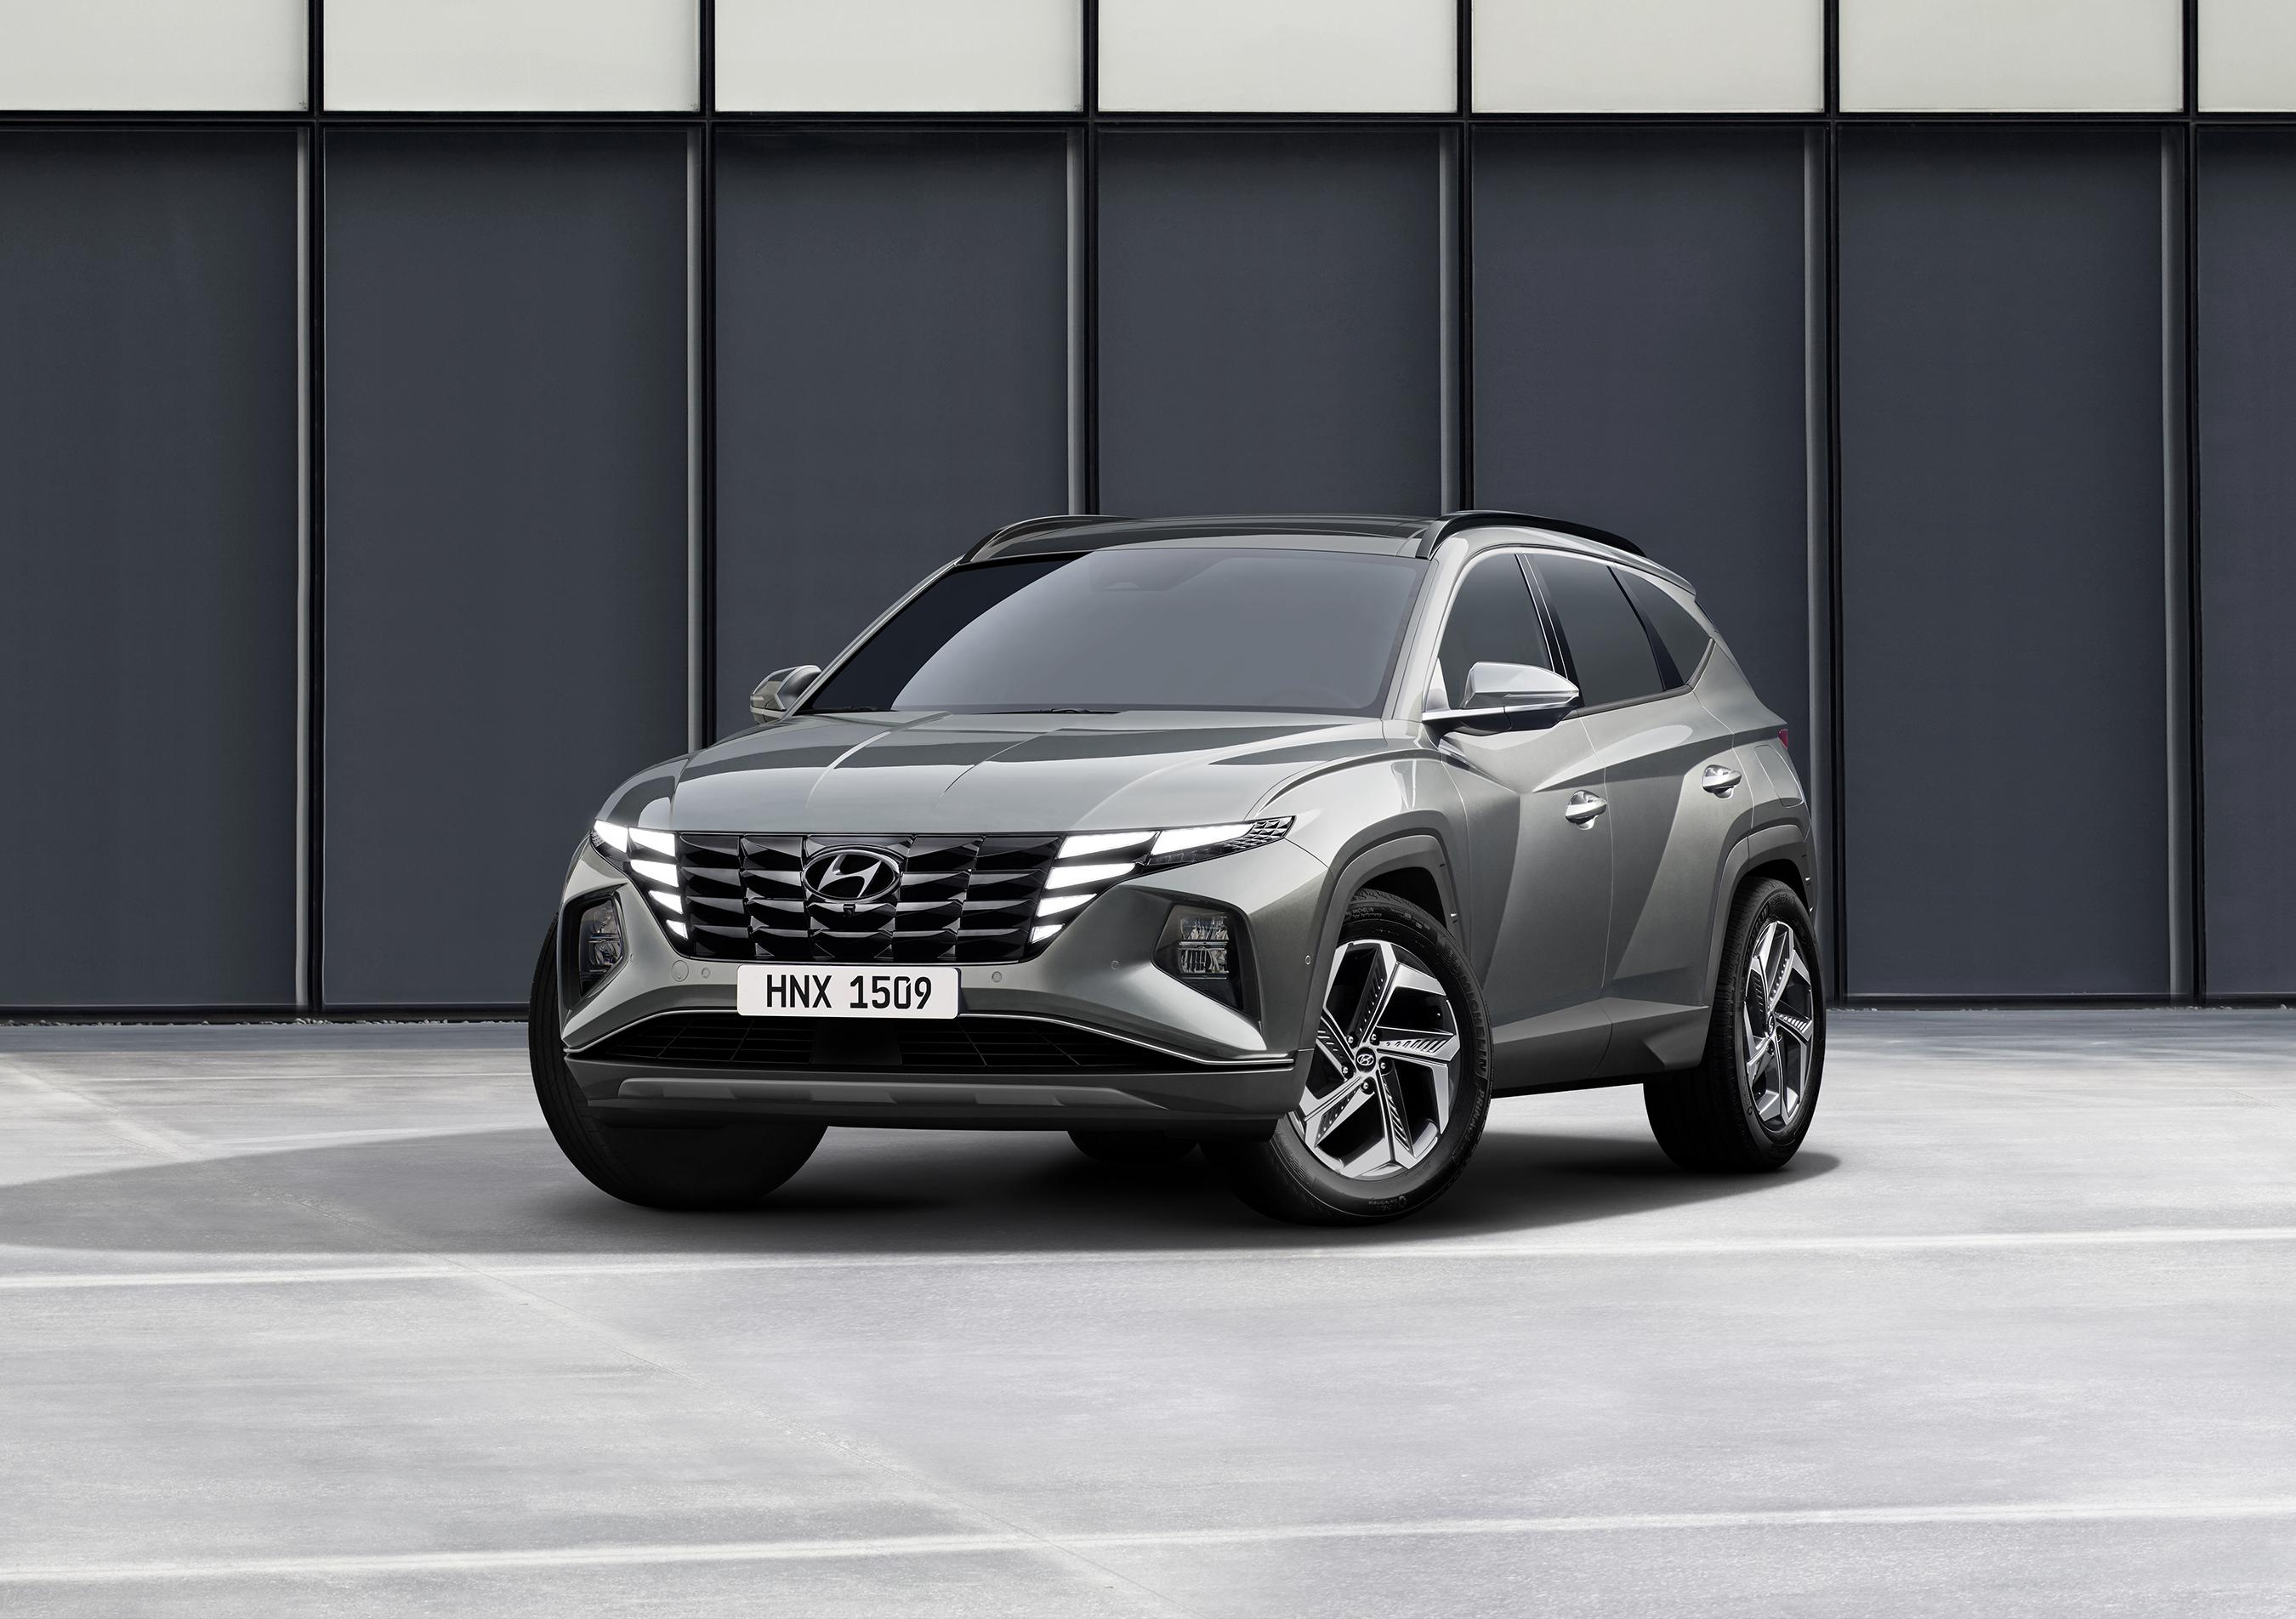 Hyundai Motor Company today launched the all-new Hyundai Tucson